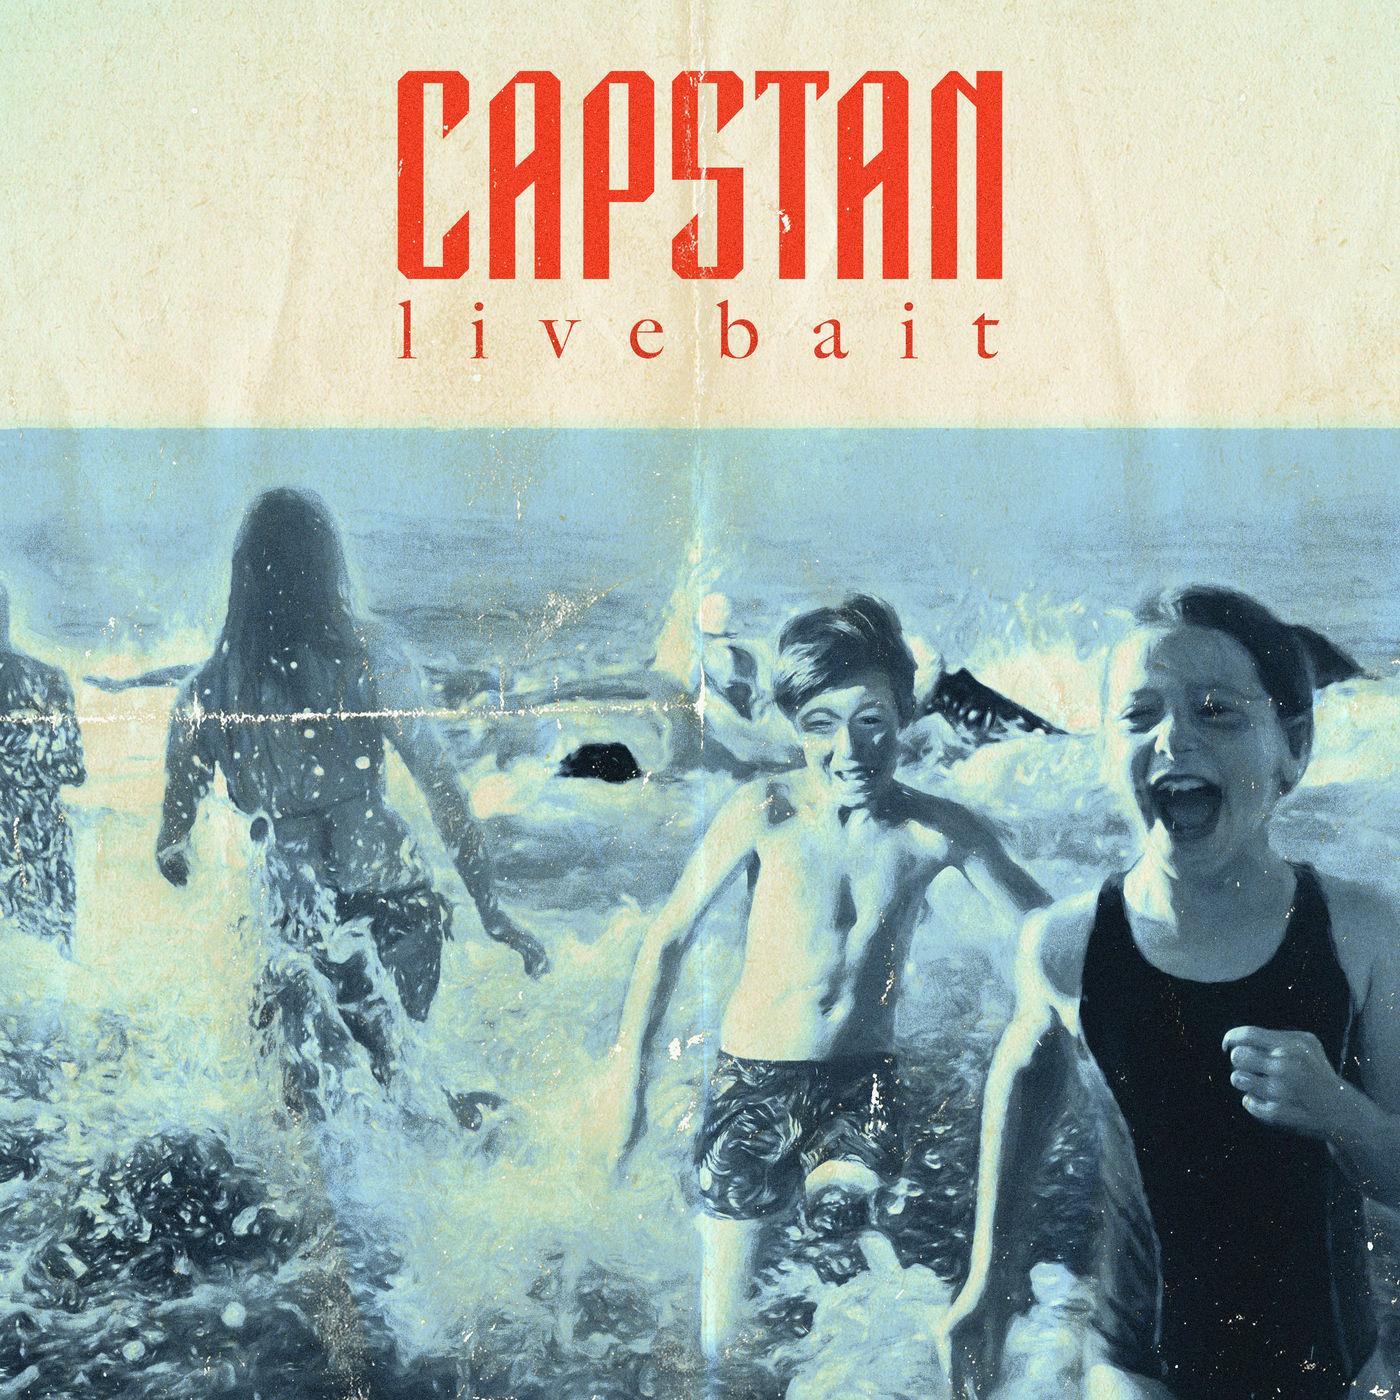 Capstan - livebait [single] (2020)